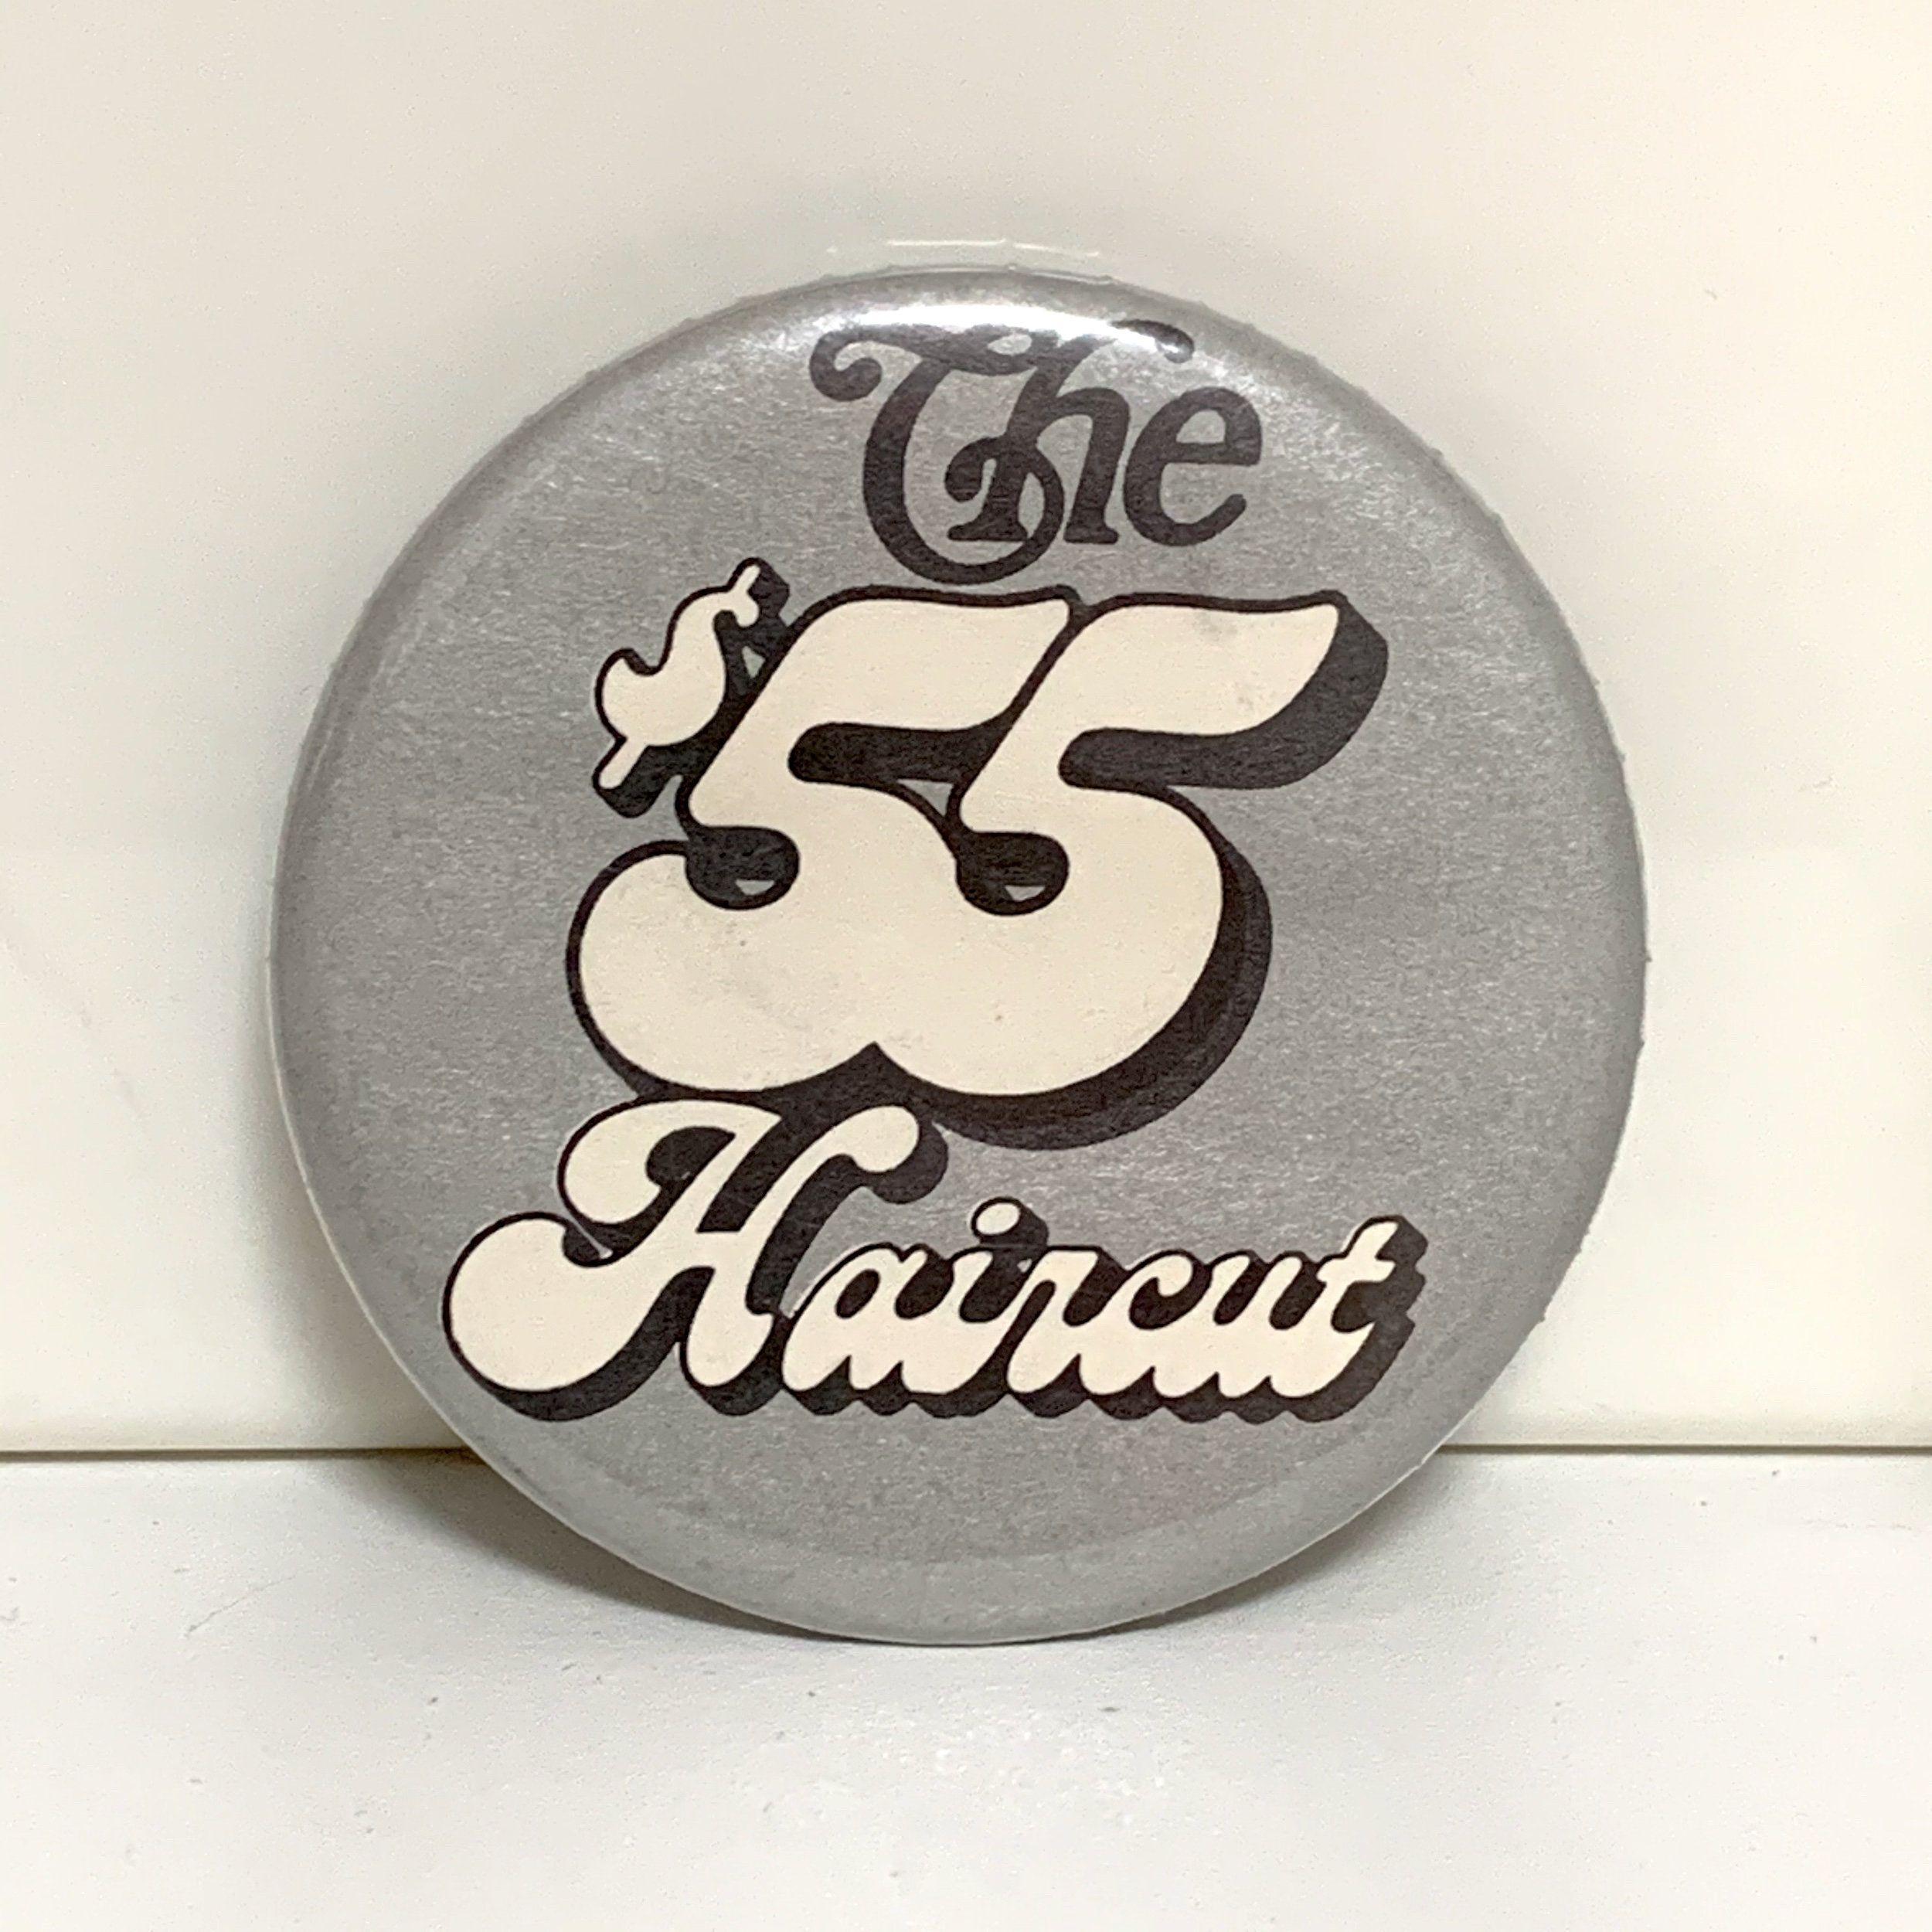 Vintage Pinback Button The 55 Dollar Haircut Fifty Five Etsy In 2020 Buttons Pinback Pinback Vintage Silver